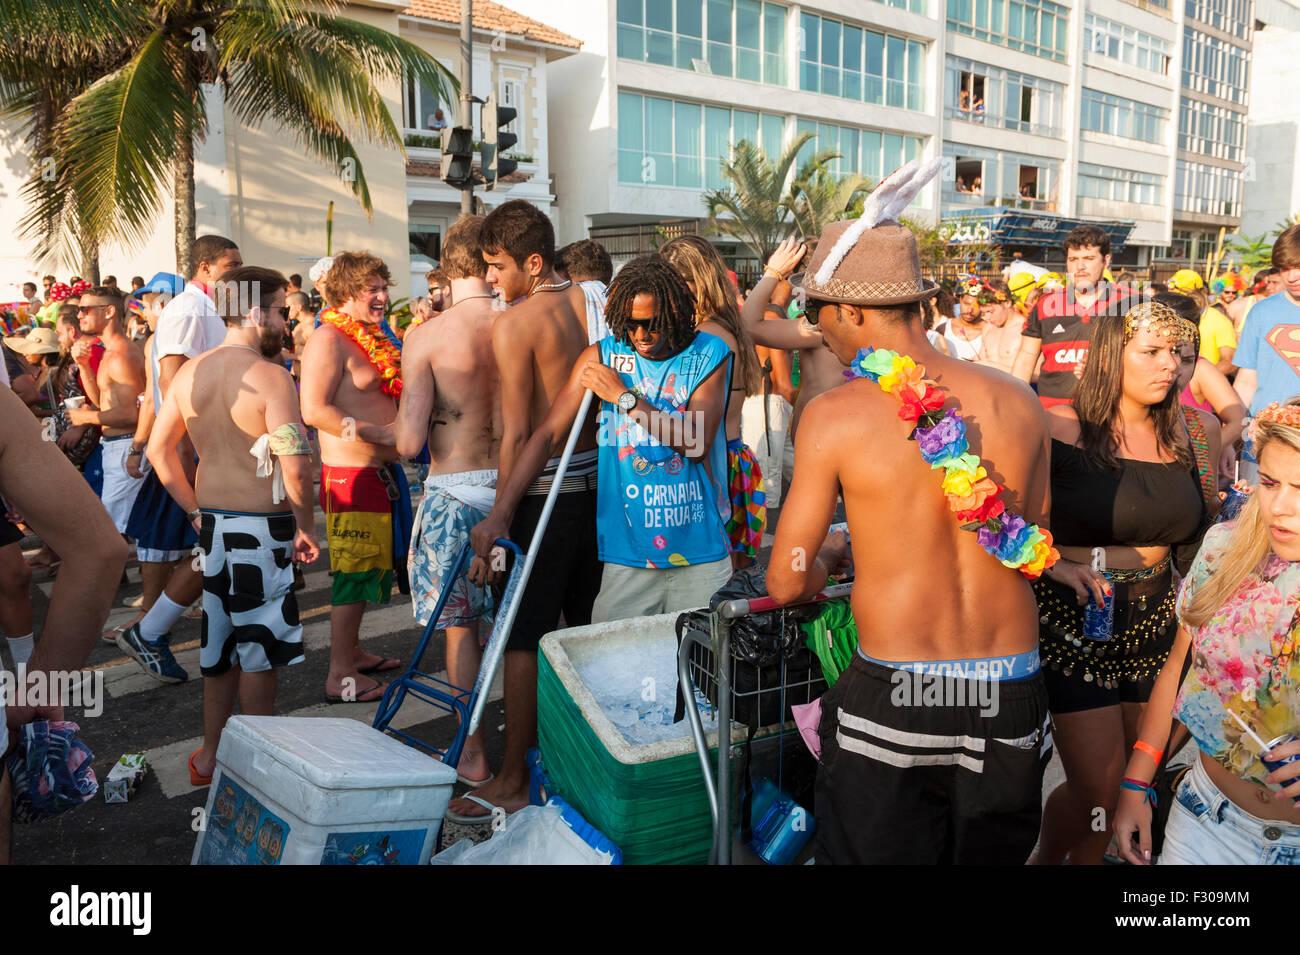 RIO DE JANEIRO, BRAZIL - FEBRUARY 07, 2015: Crowds of Brazilians celebrate at a carnival banda street party in Ipanema. - Stock Image